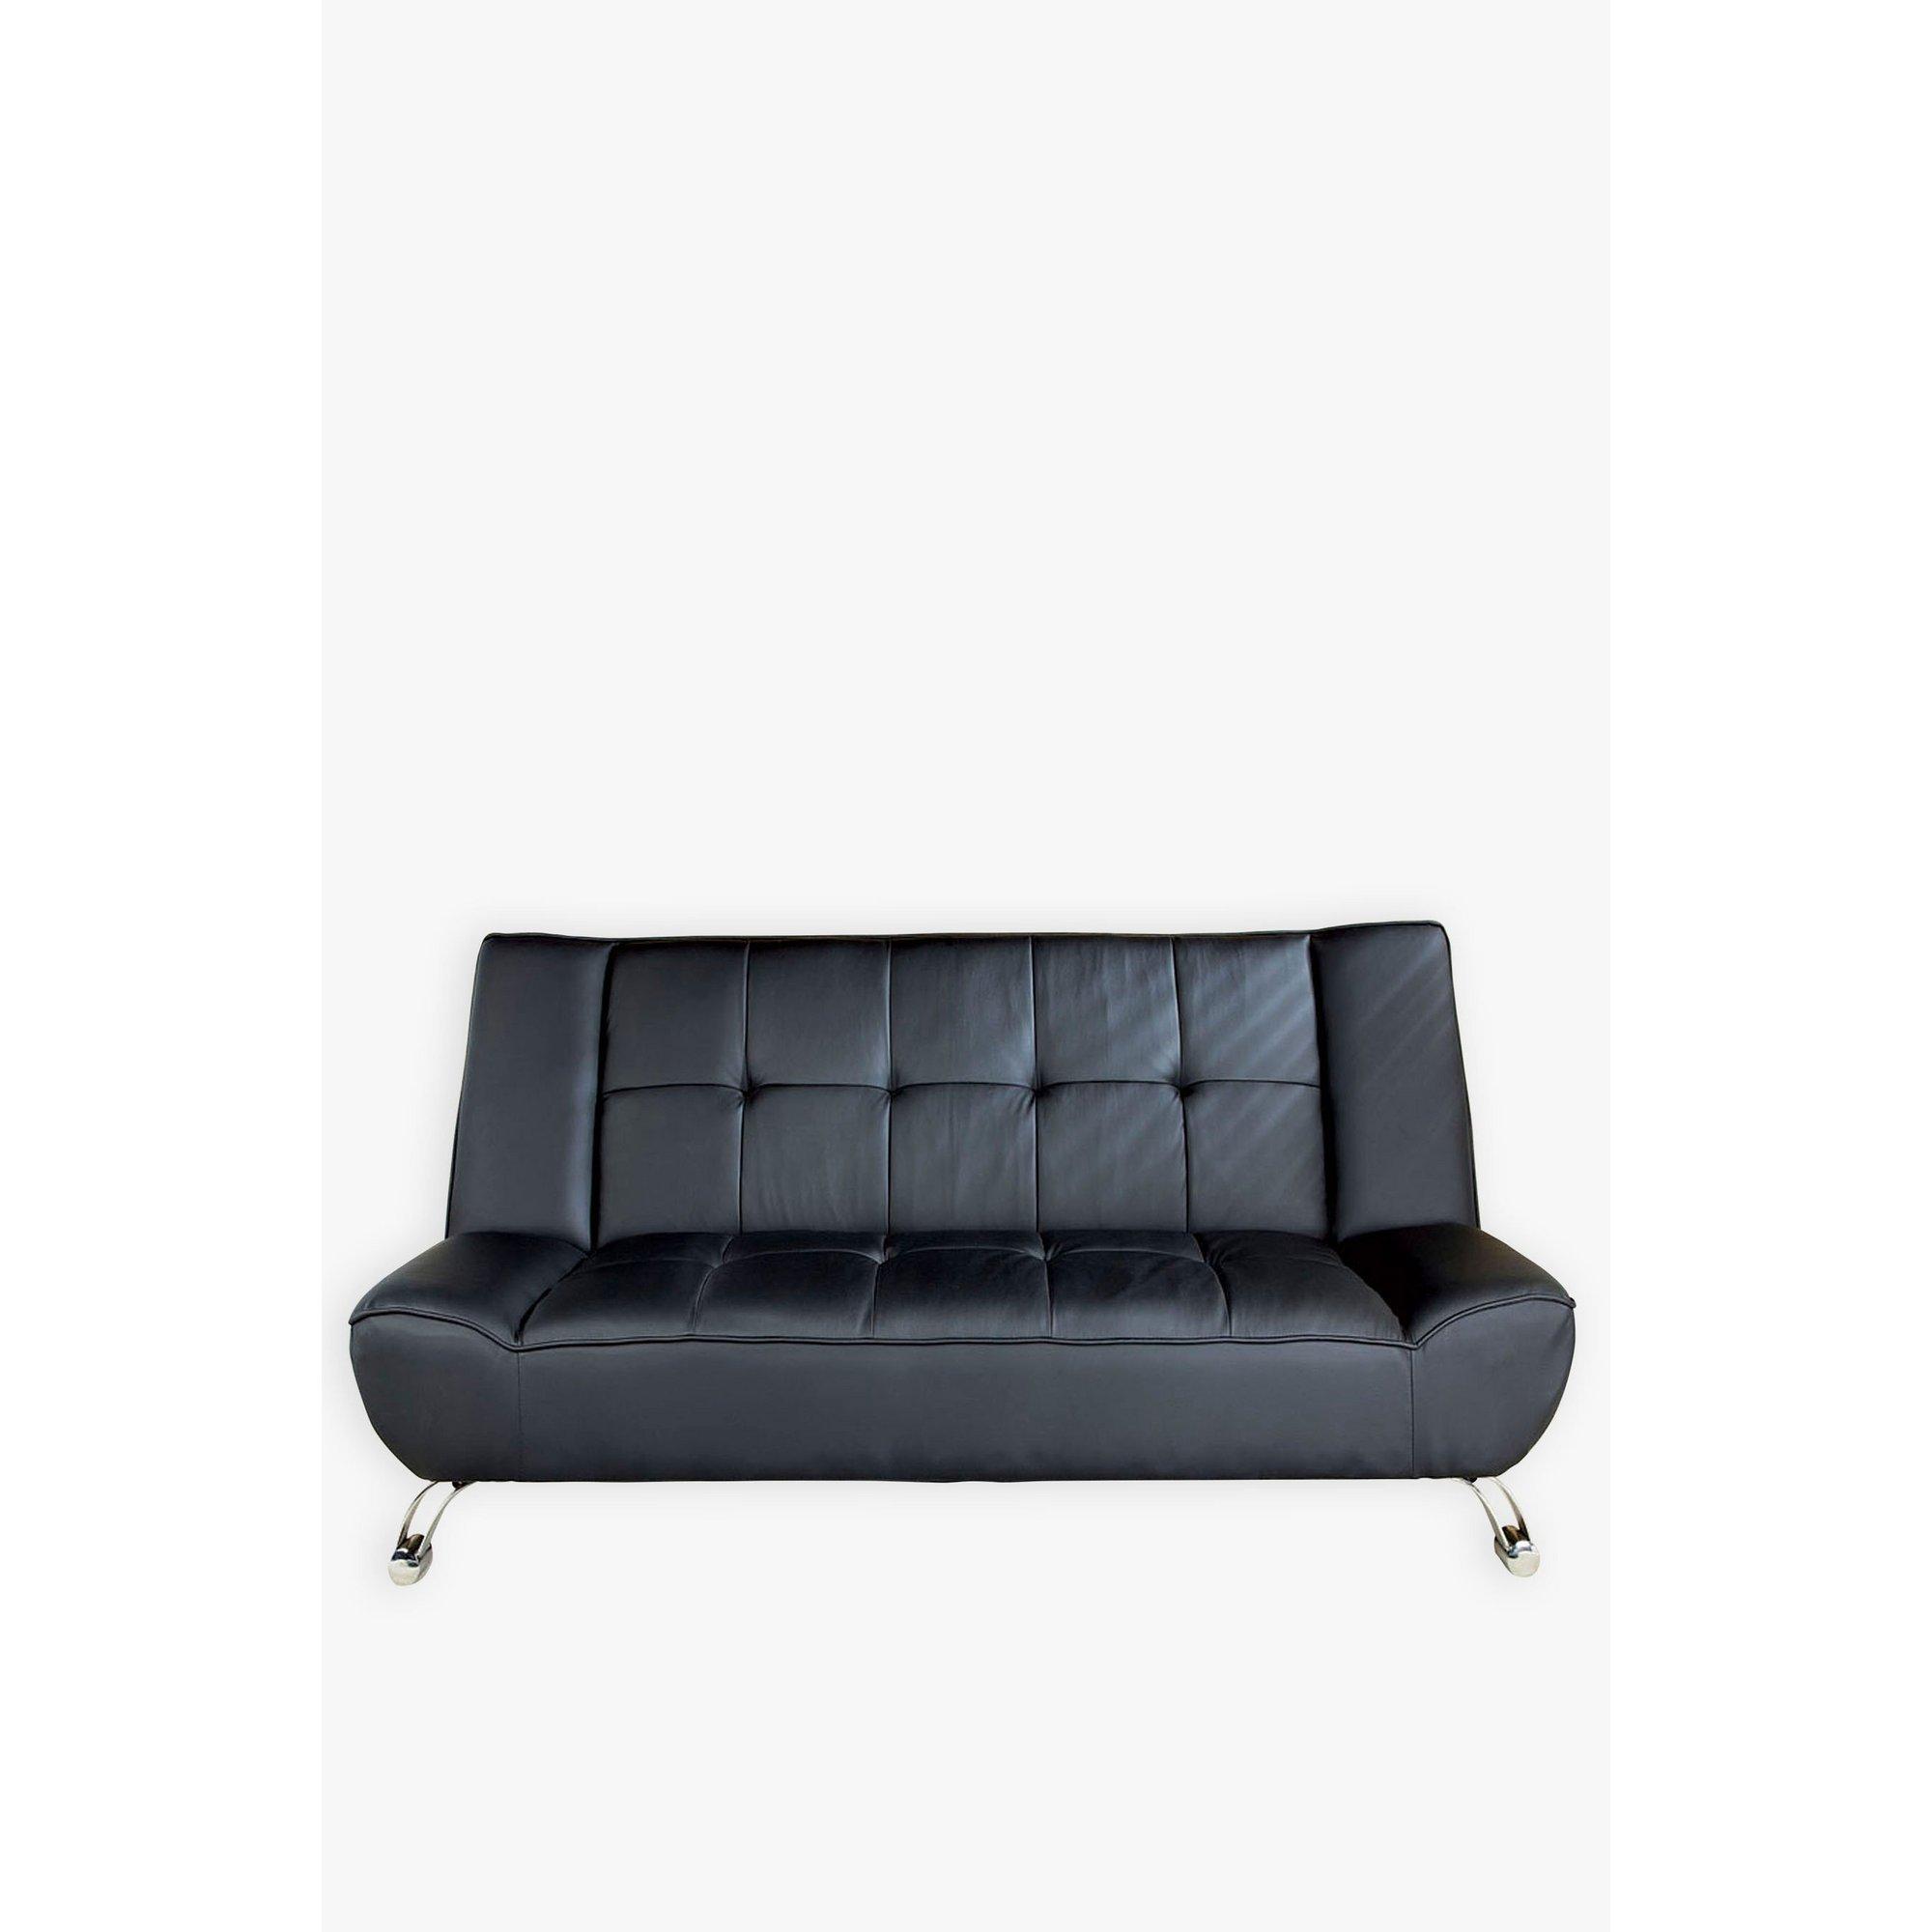 Image of Genoa Faux Leather Sofa Bed